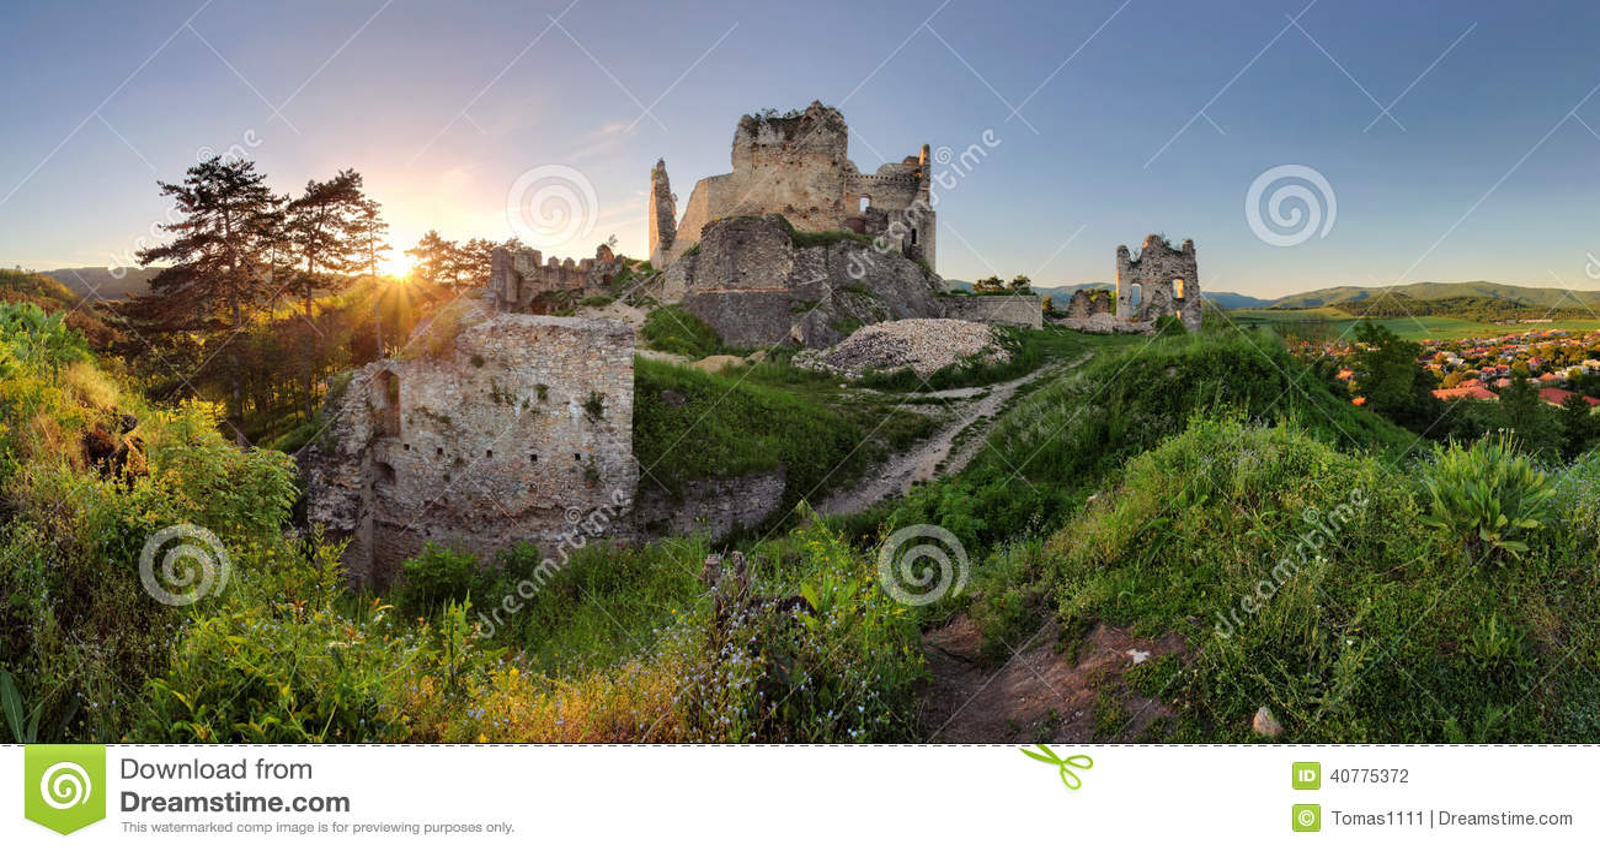 Slovakia castle - Divin